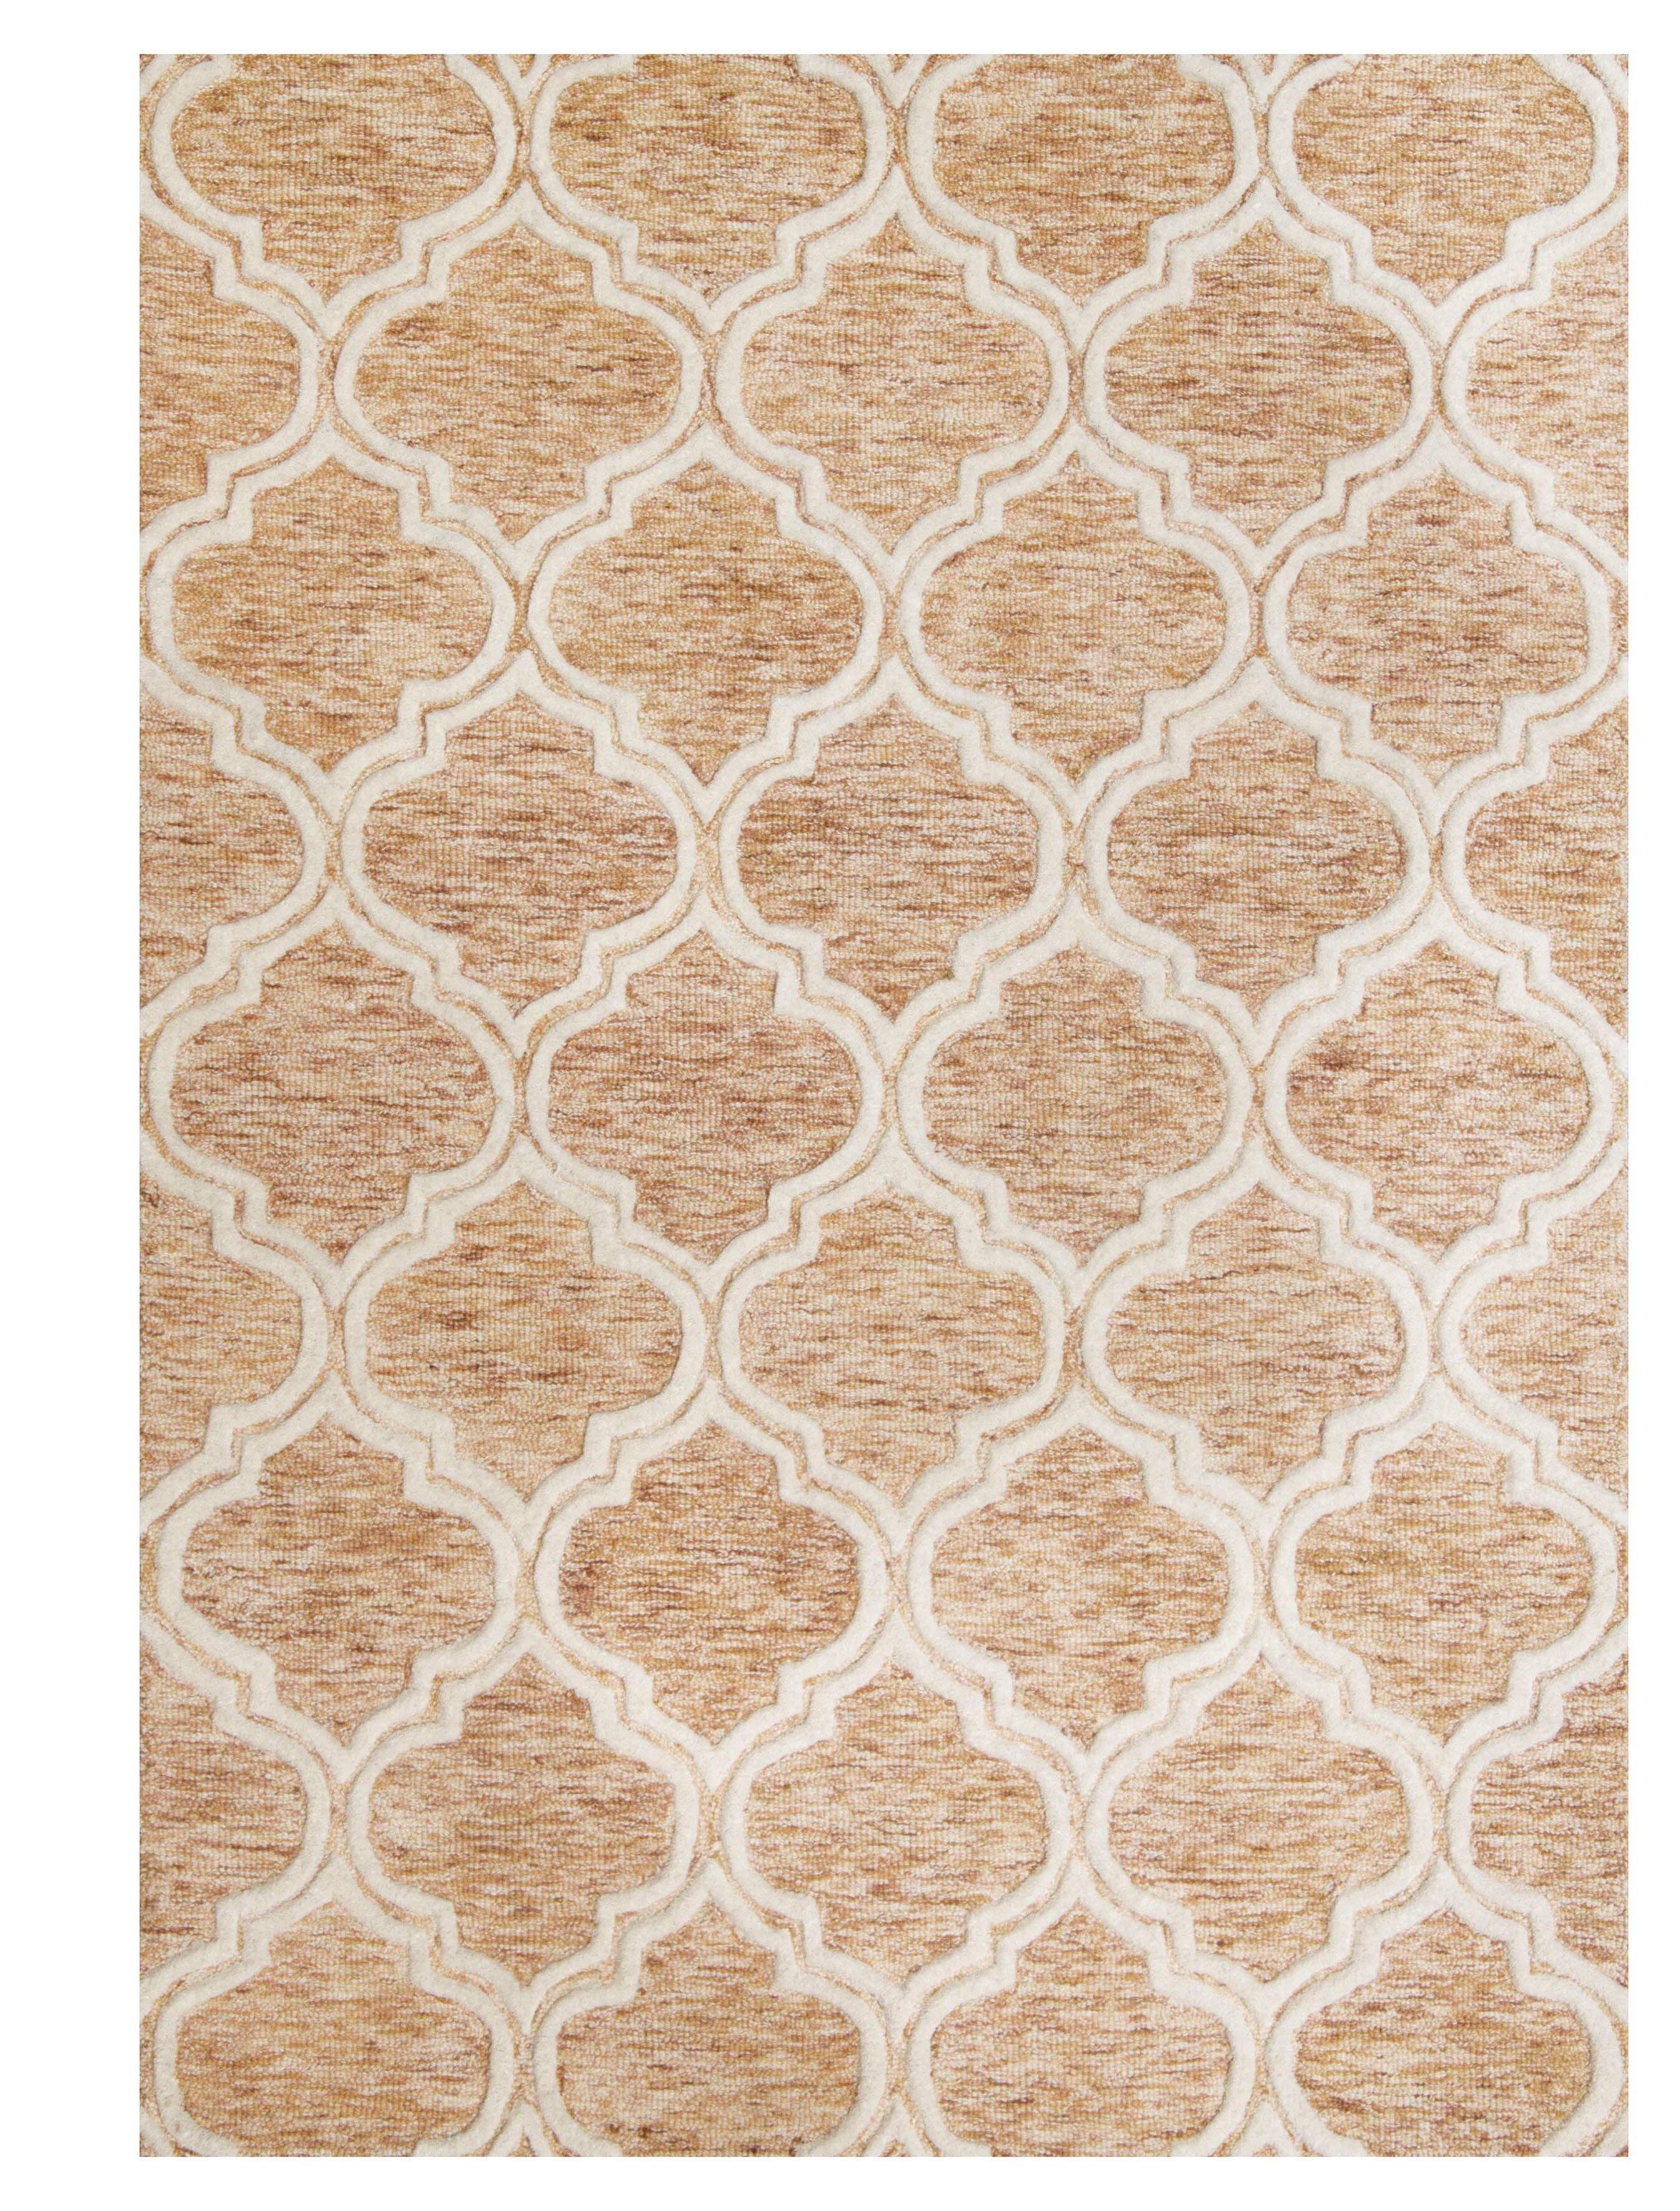 World Menagerie Hornsea Hand Tufted Wool Brown Rug Reviews Wayfair Co Uk